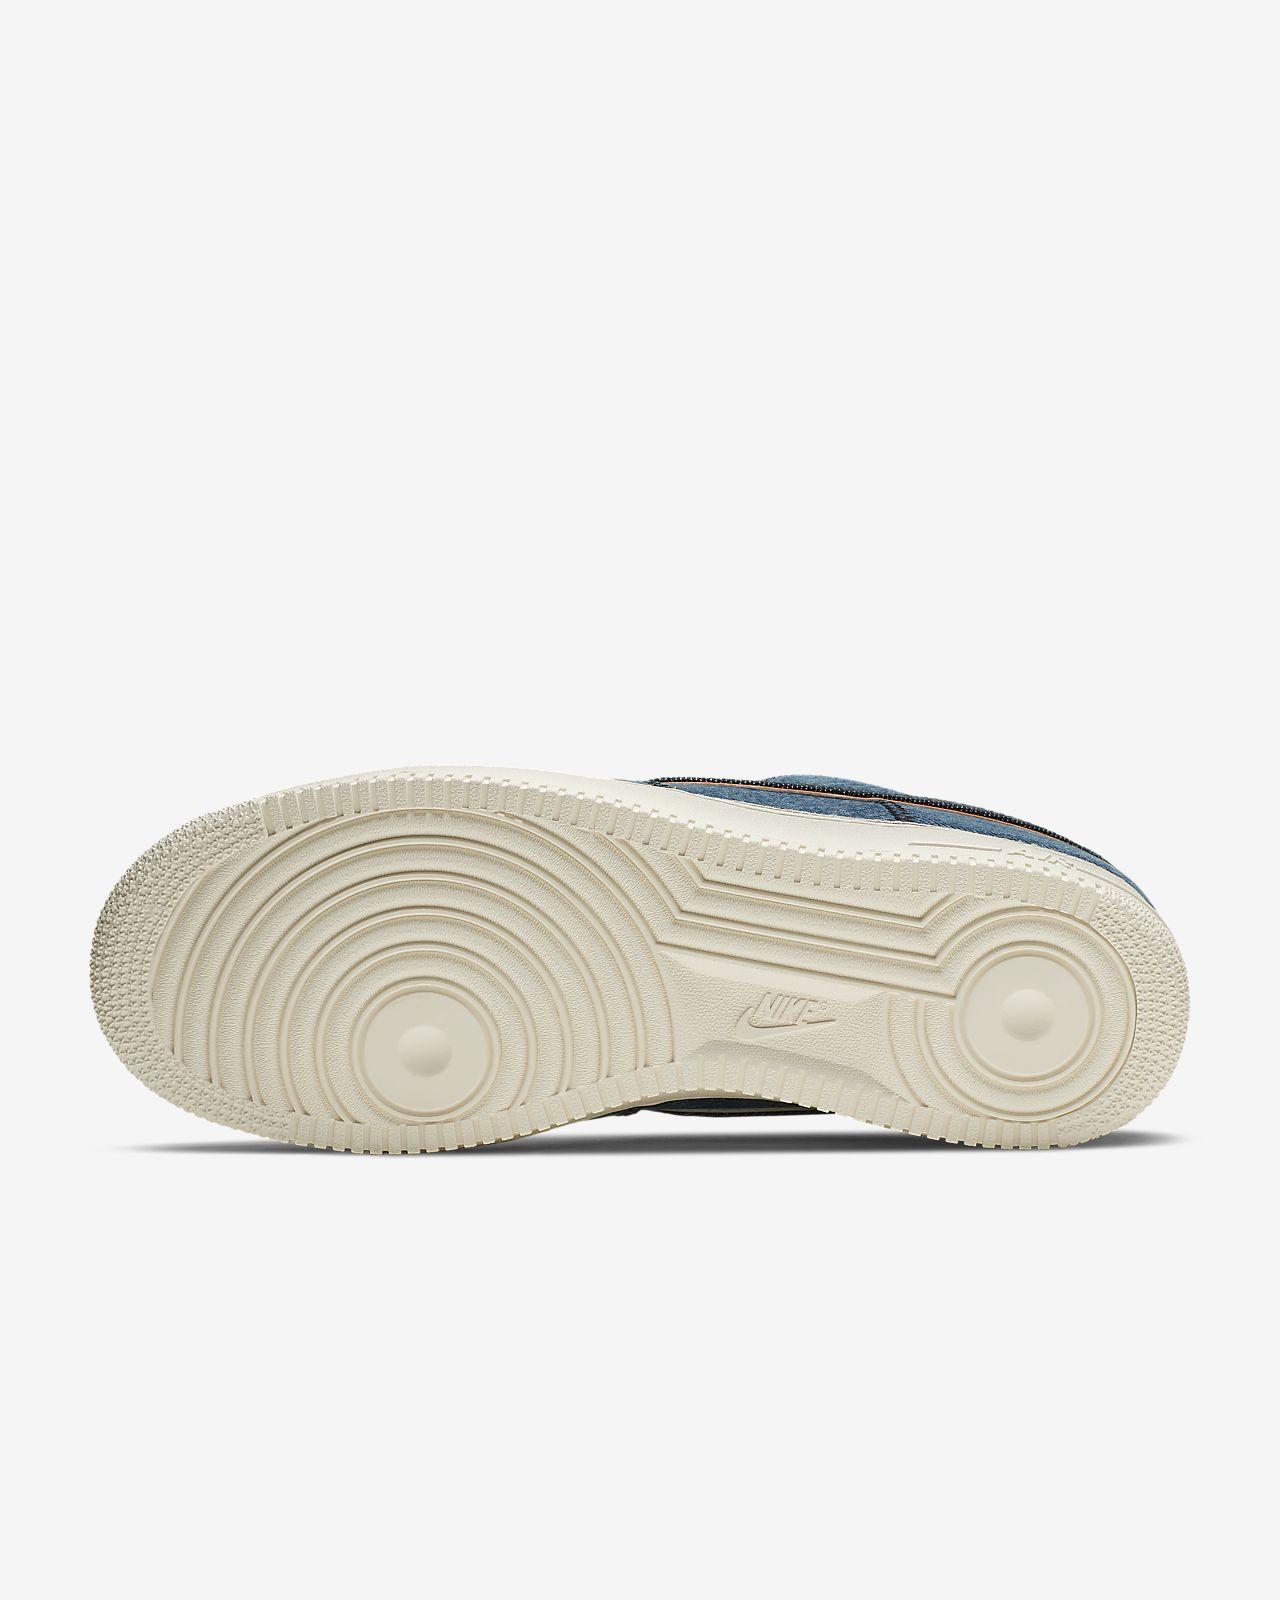 Nike's Air Force 1 '07 Premium Arrives in Vachetta Tan Leather